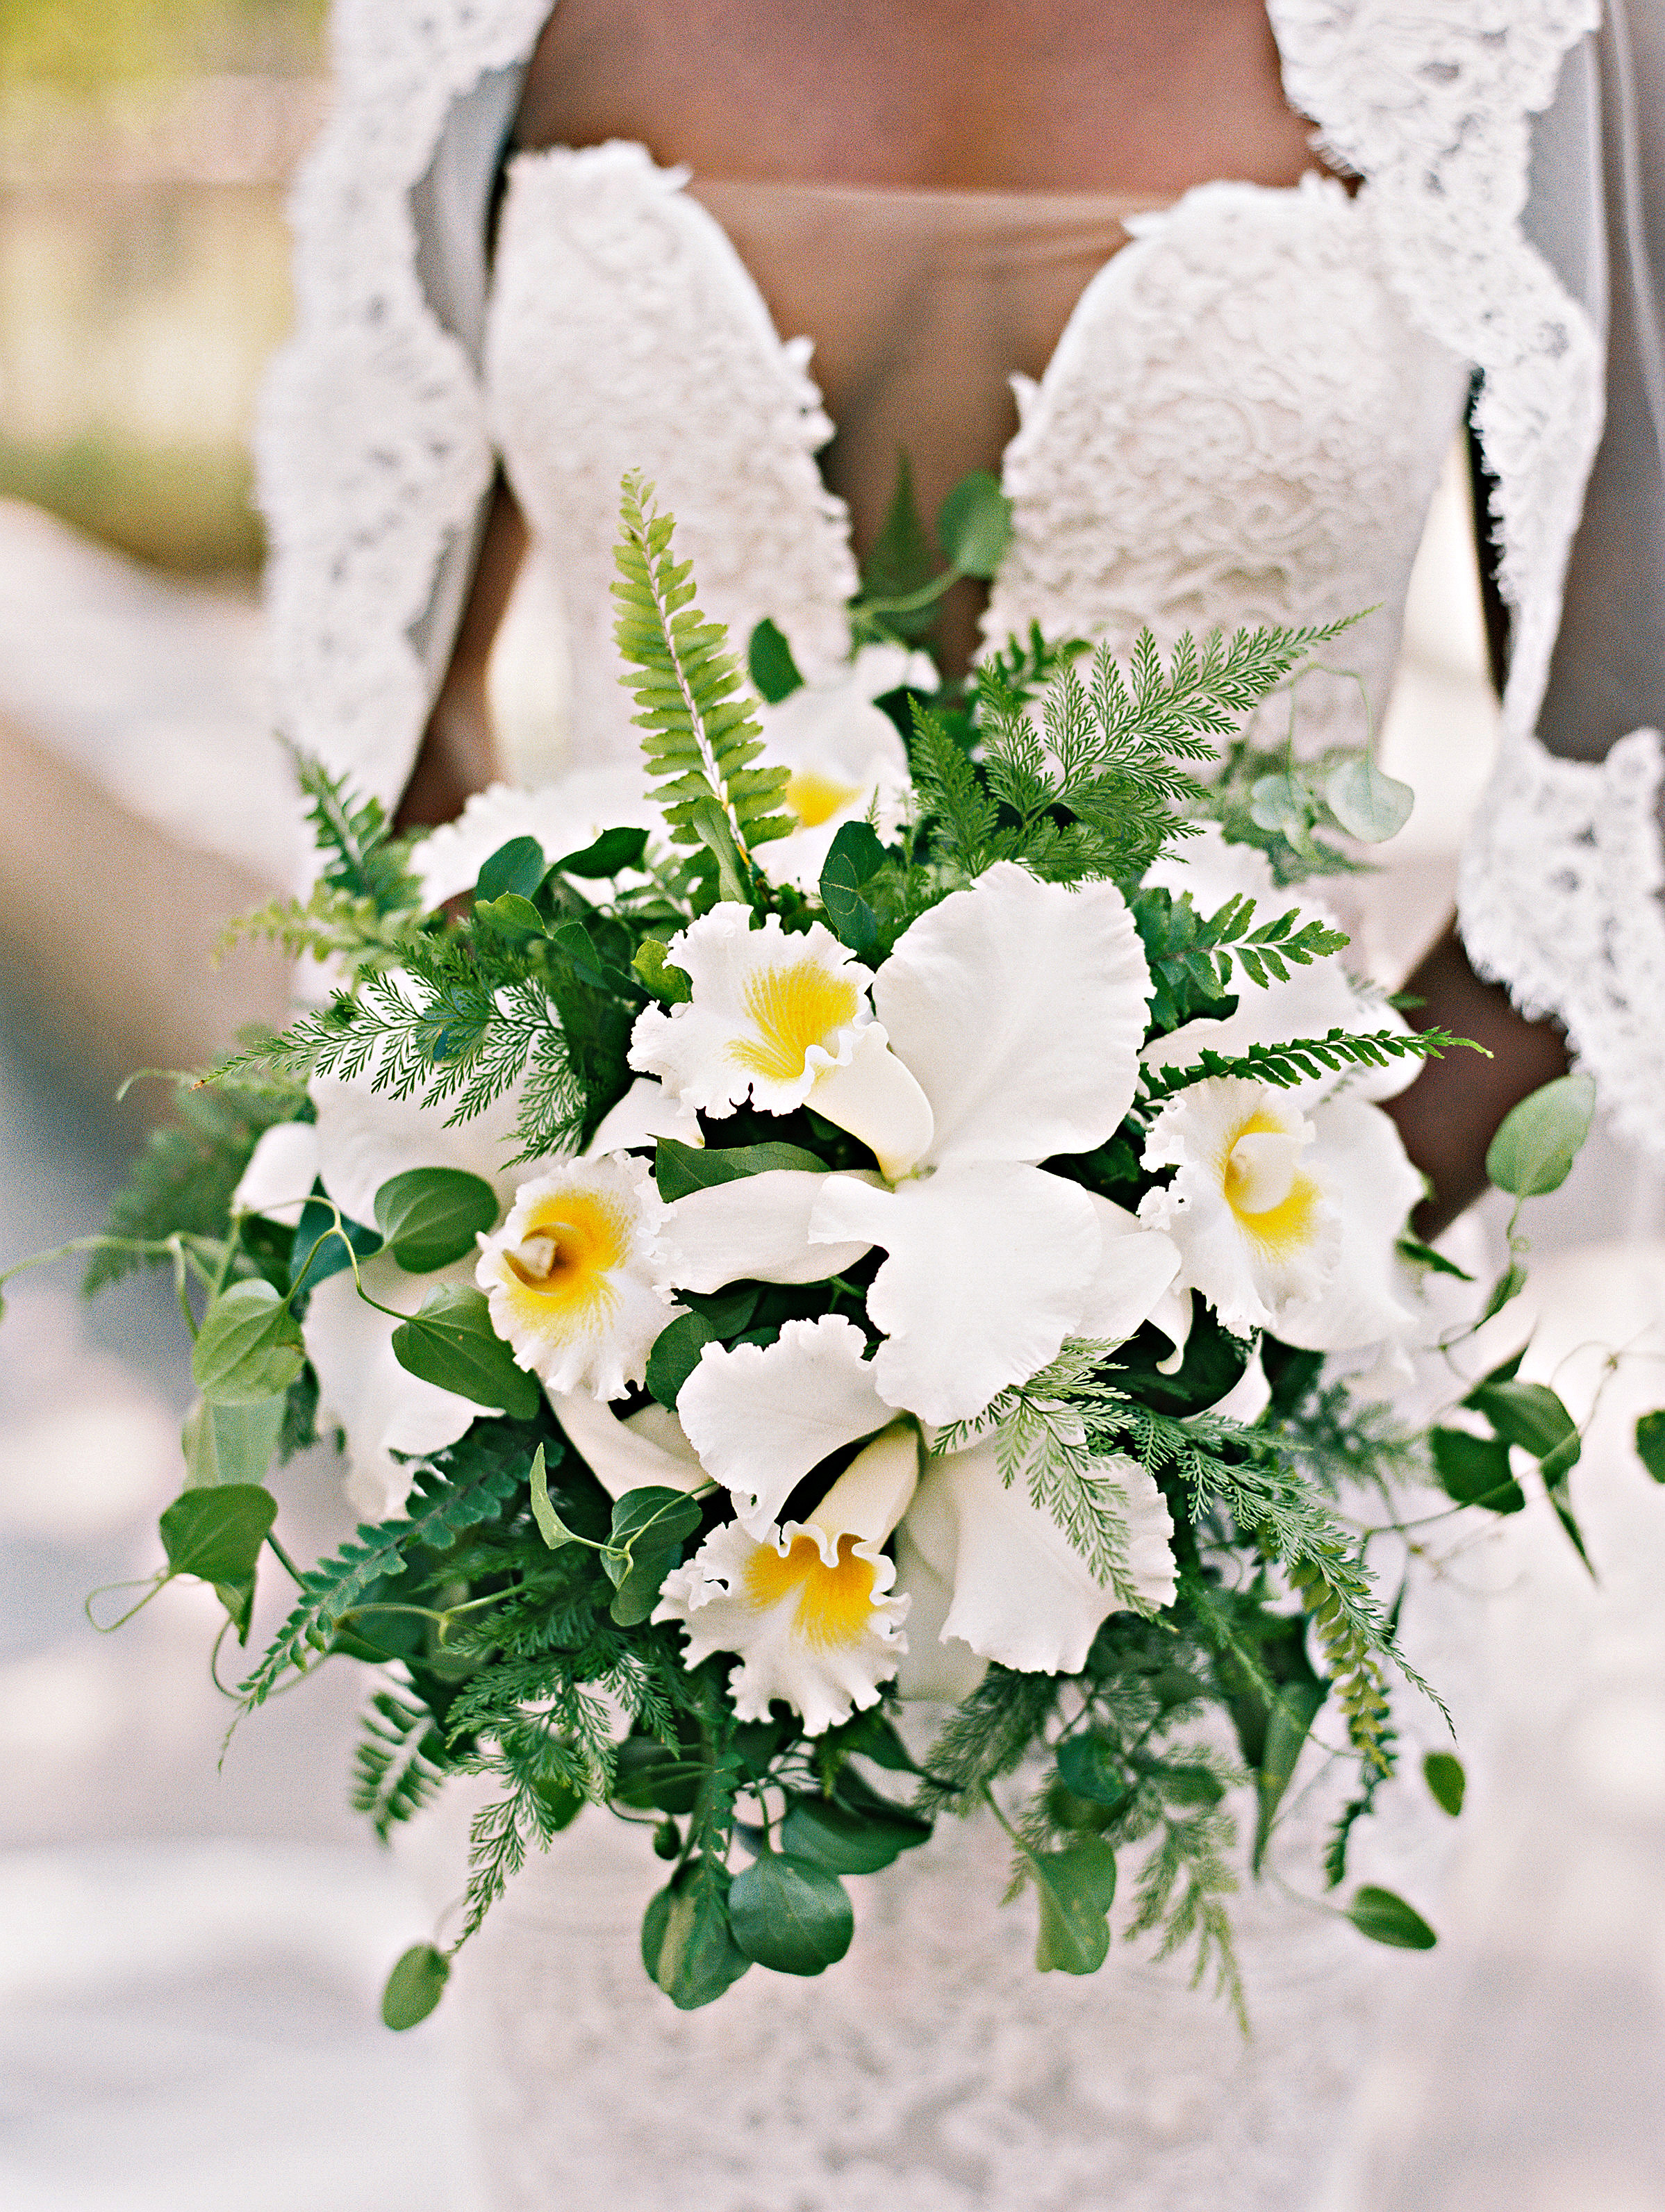 lindsey william wedding dc bouquet